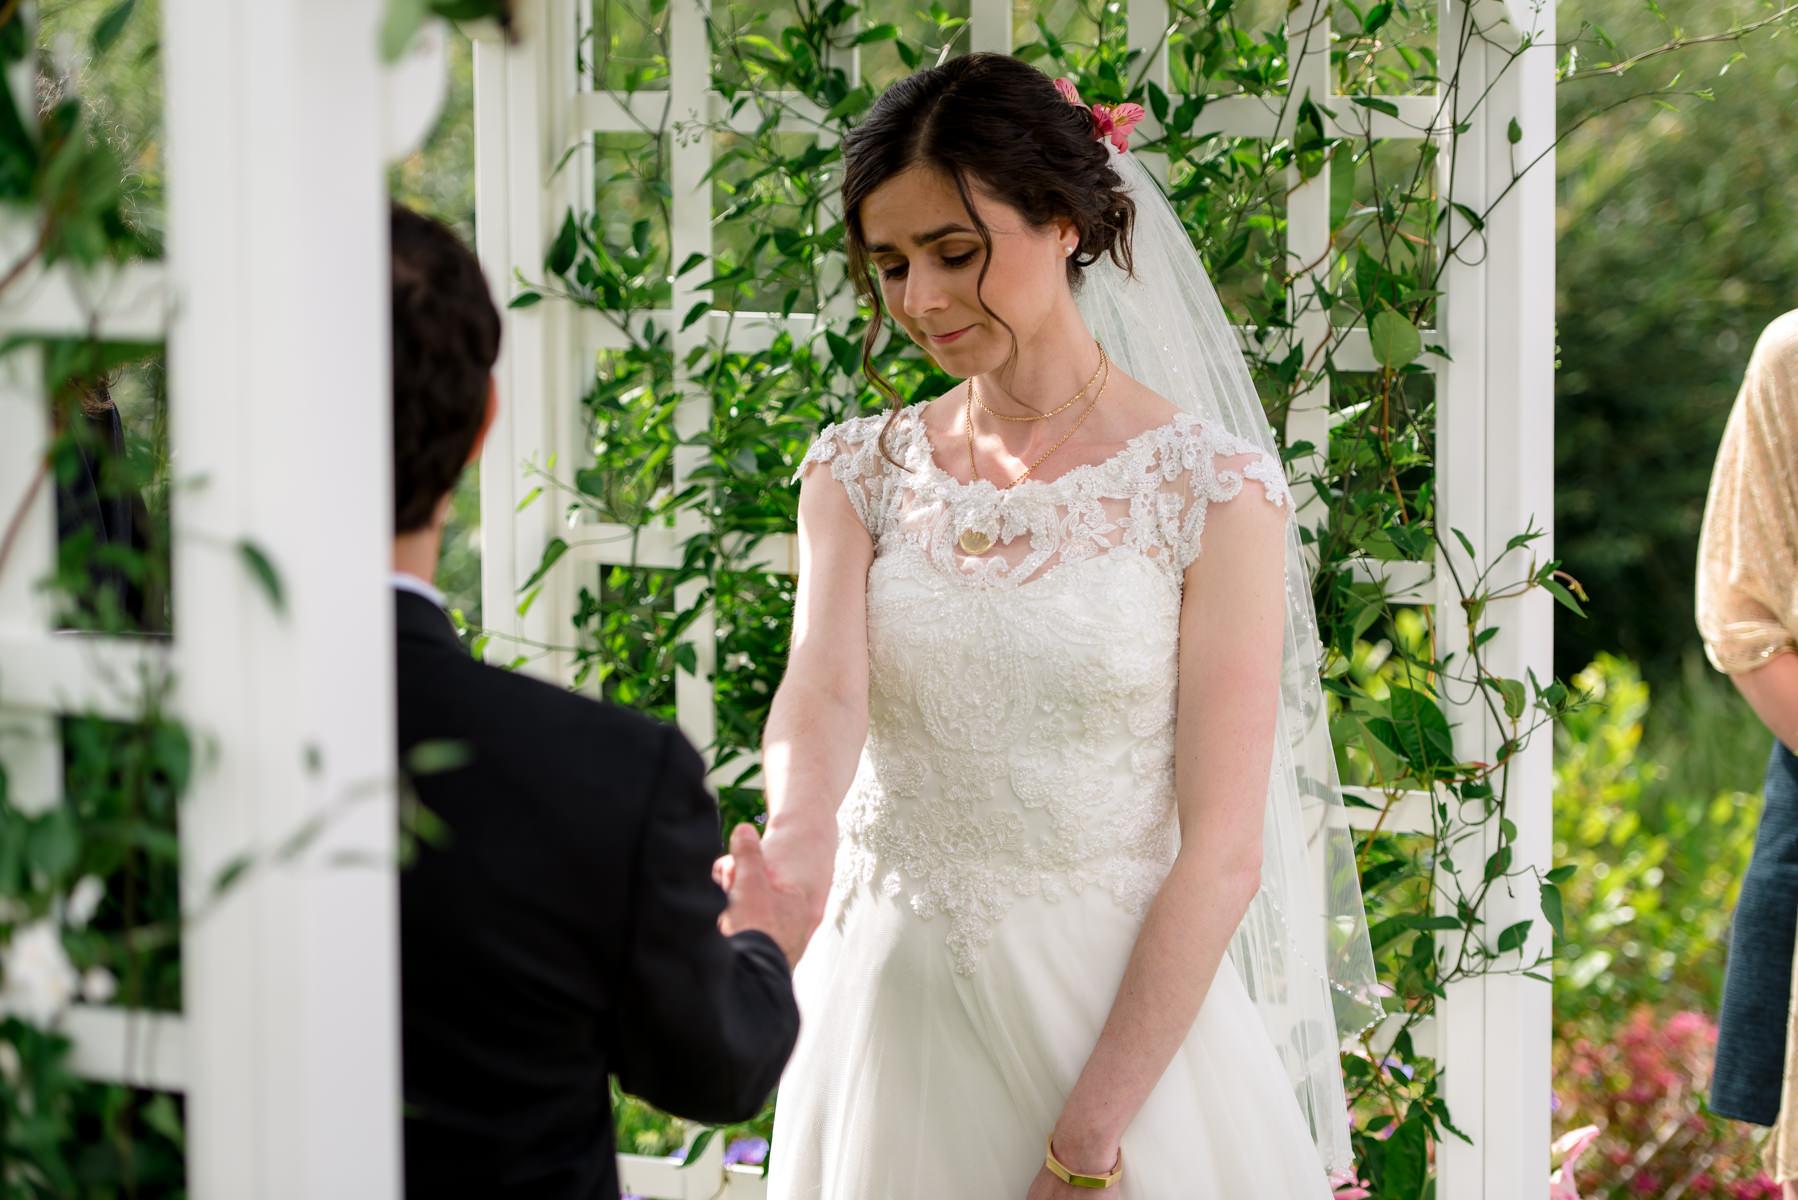 Andrew Tat - Documentary Wedding Photography - Kirkland, Washington - Emily & Cuauh - 10.JPG